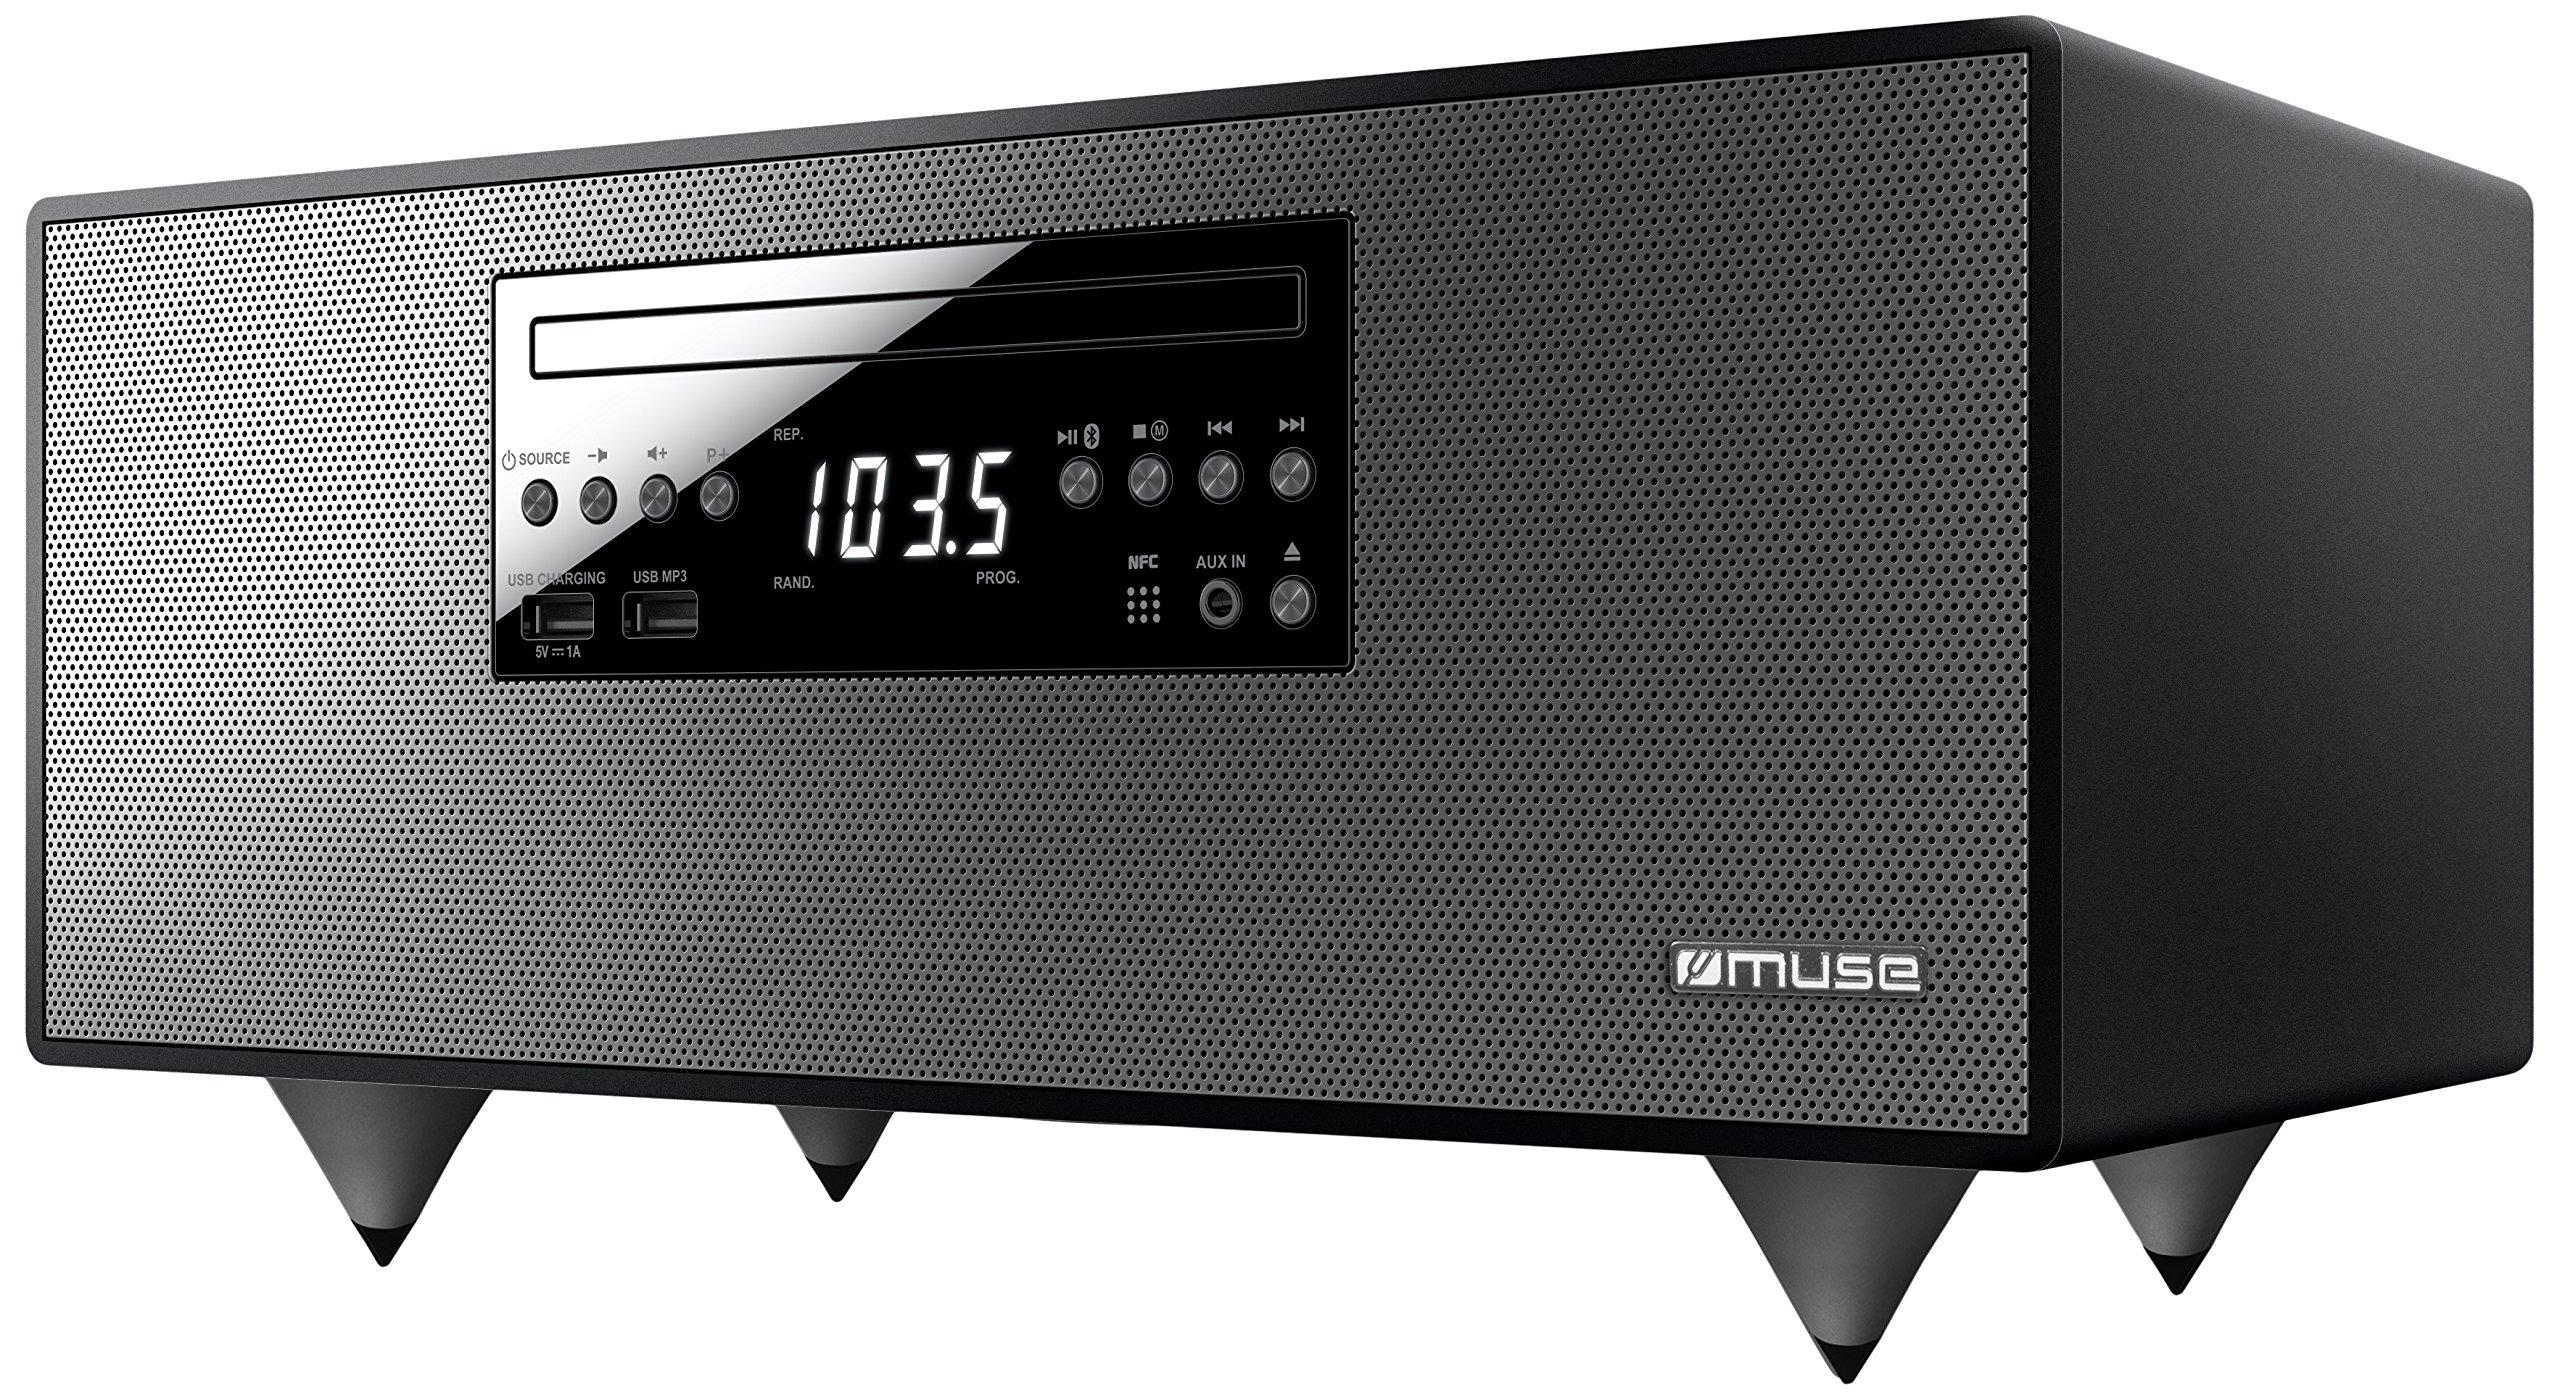 Muse M-690BTC Sistema estéreo portátil Digital 60 W Negro - Radio CD (Digital, FM, 87,5 - 108 MHz, Jugador, CD,CD-R,CD-RW, Frente): Muse: Amazon.es: Electrónica